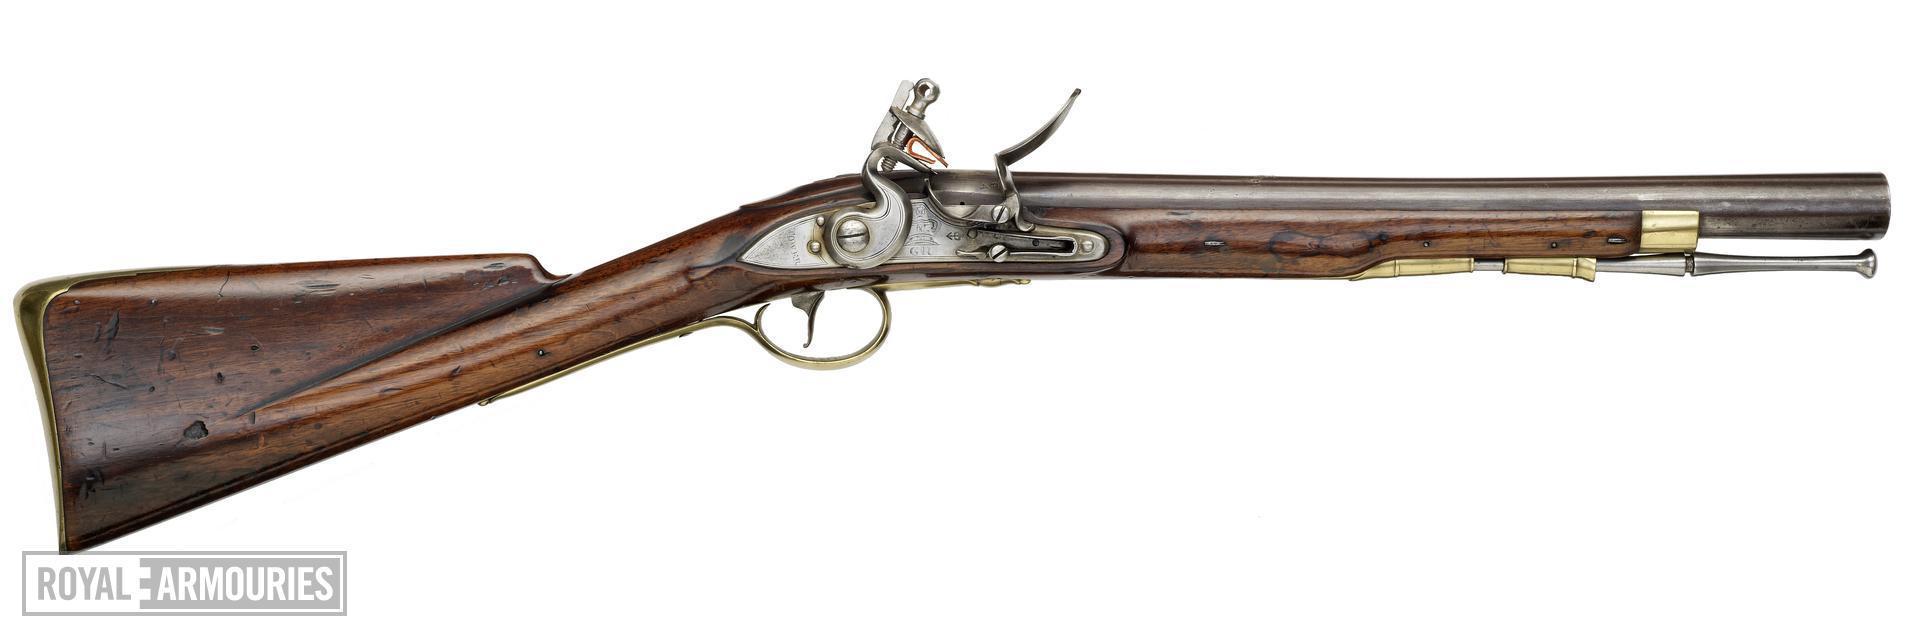 Flintlock muzzle-loading blunderbuss - 1781 Burgoyne's Musketoon Steel barrel with elliptical muzzle.